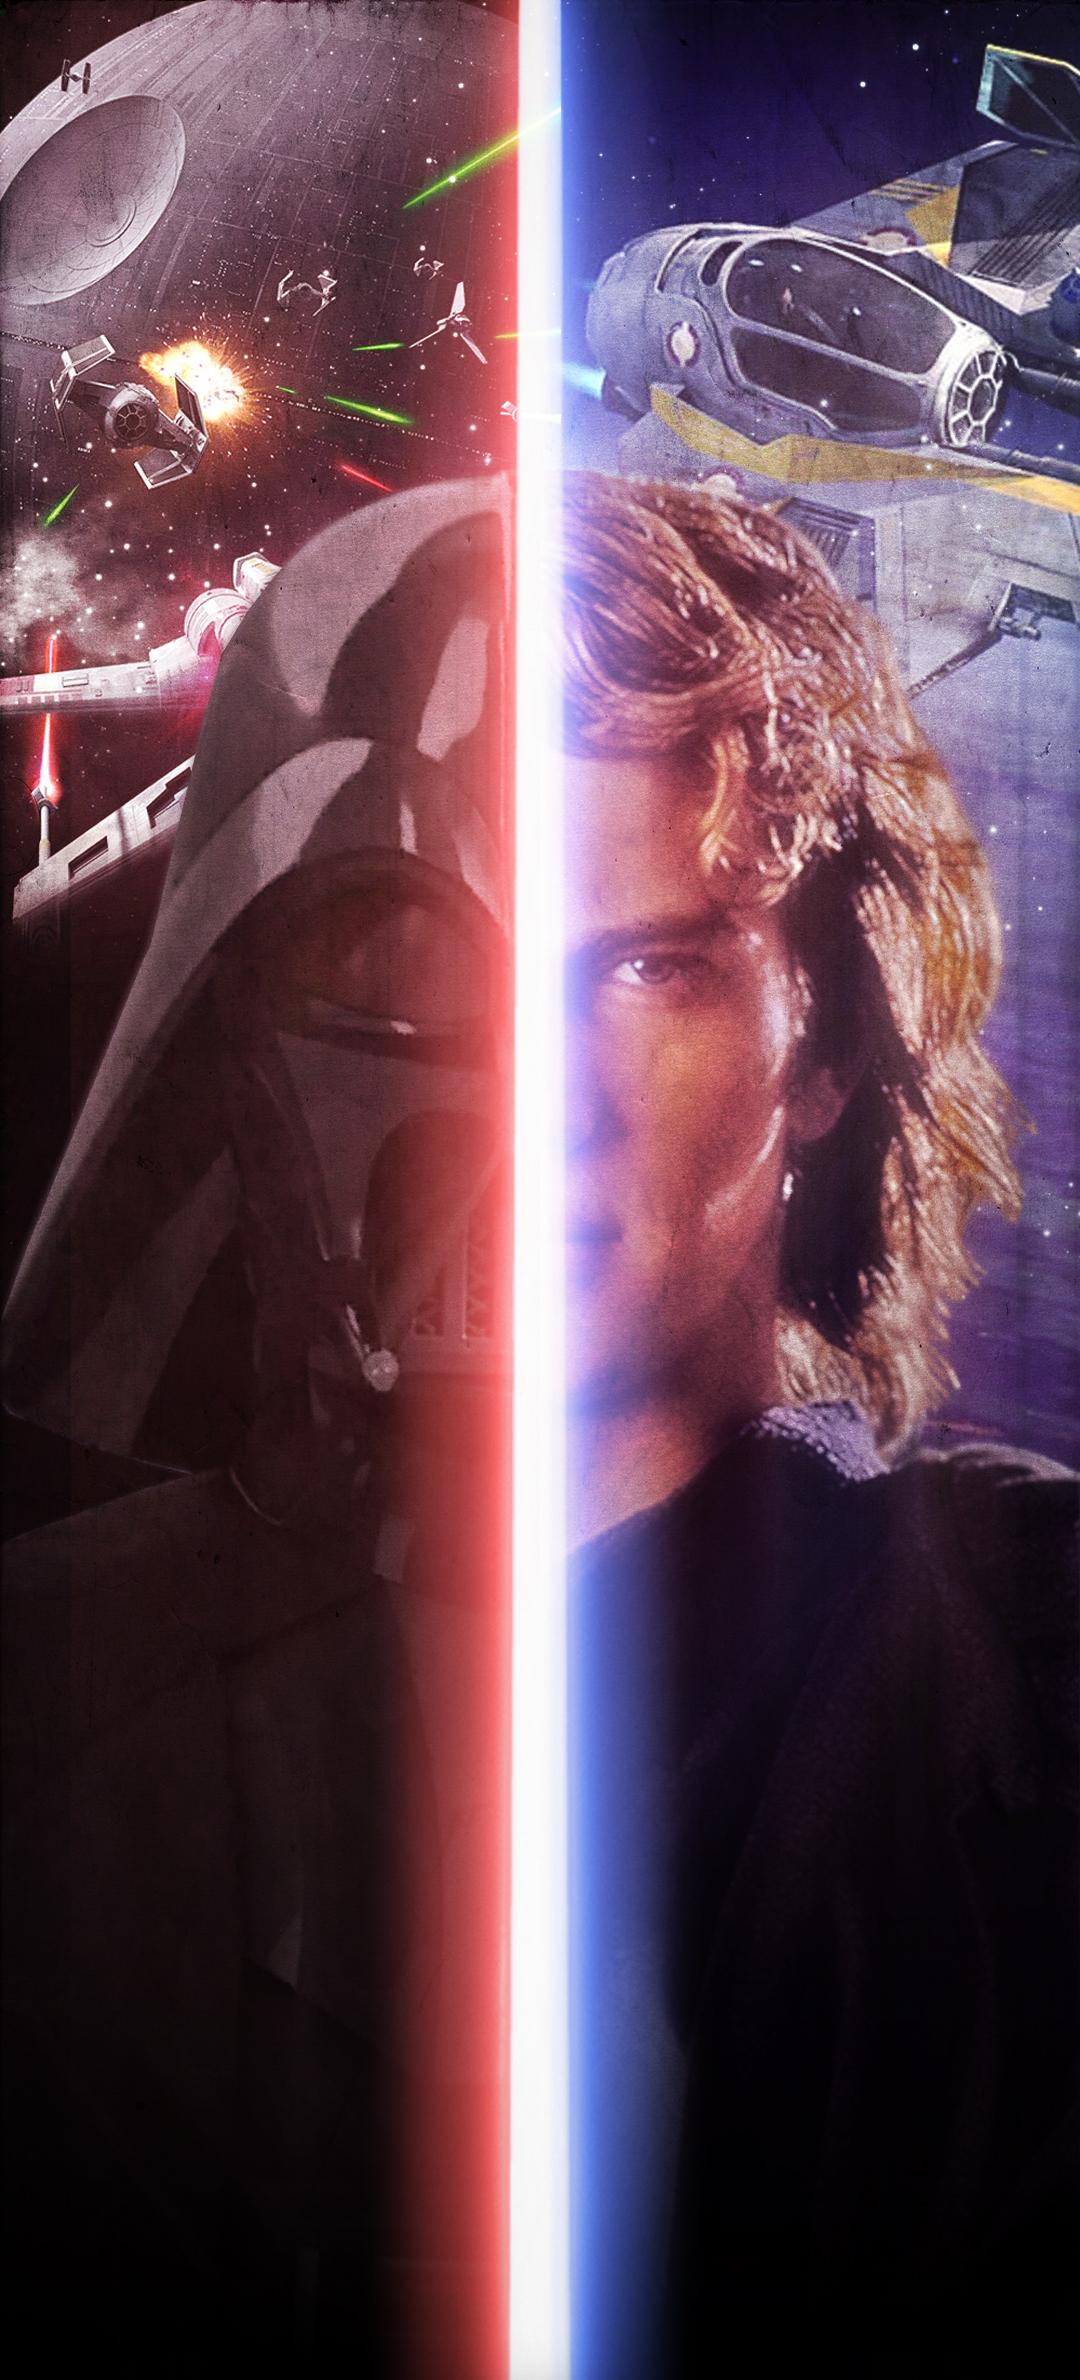 Darth Vader Anakin Skywalker Mobile Wallpaper By Thebjo13 On Deviantart